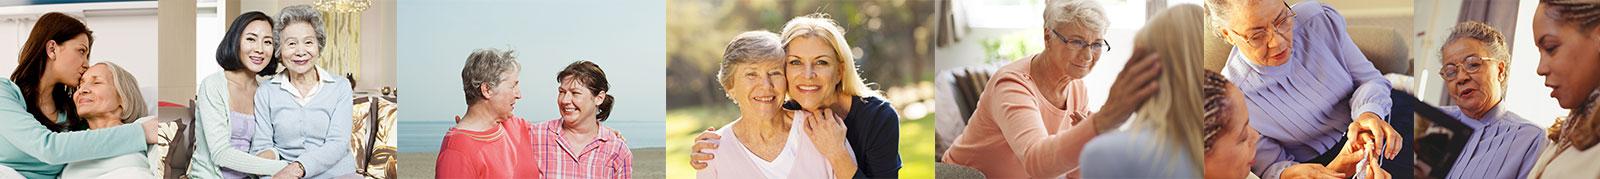 gifts-ideas-for-seniors-lpHdr.jpg